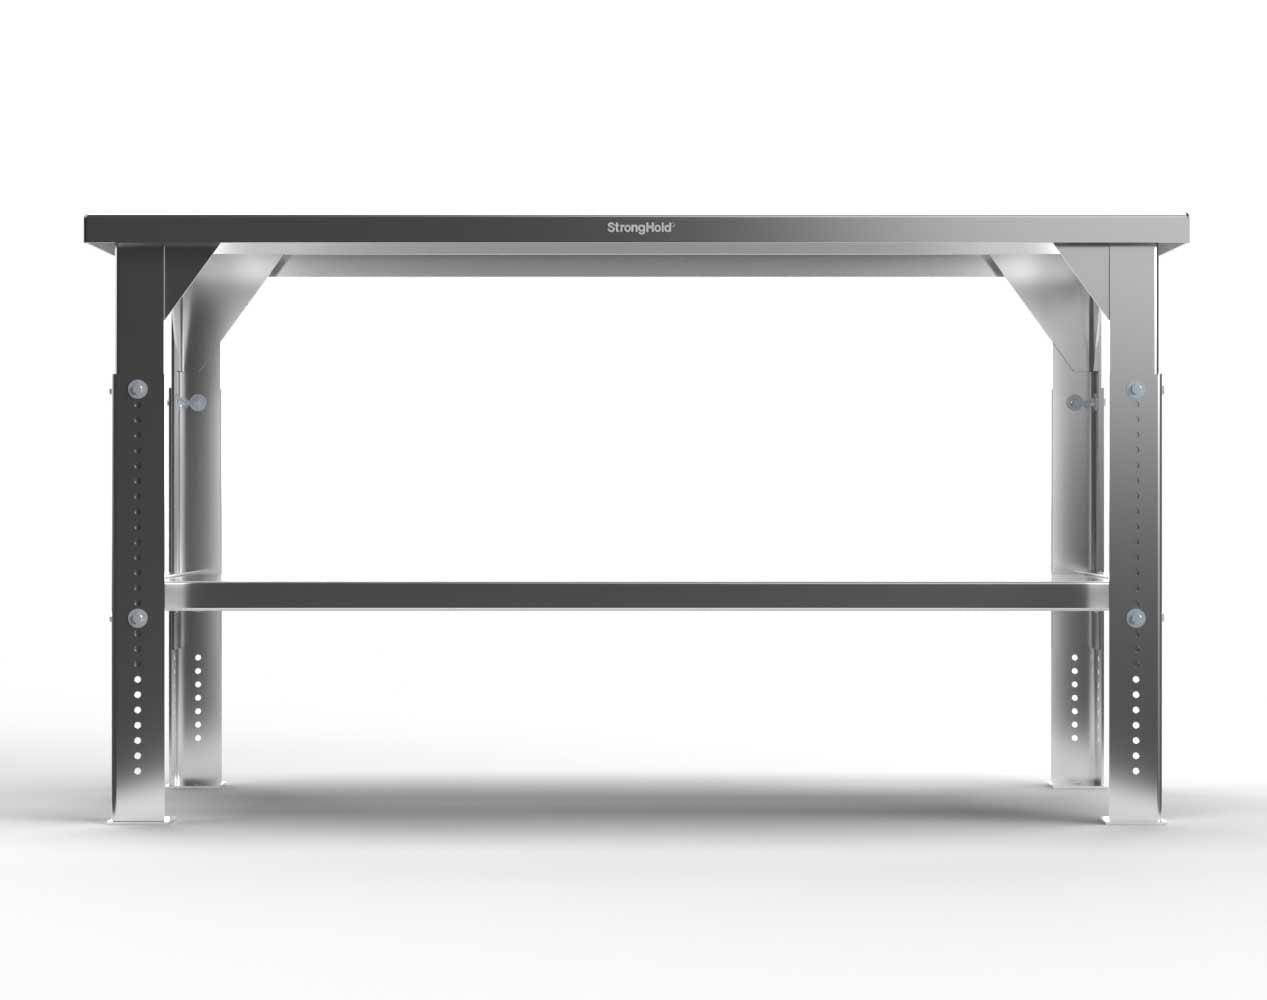 Extra Heavy Duty 7 GA Stainless Steel Shop Table, Adjustable Legs, 1 Shelf – 60 In. W x 36 In. D x 30-40 In. H